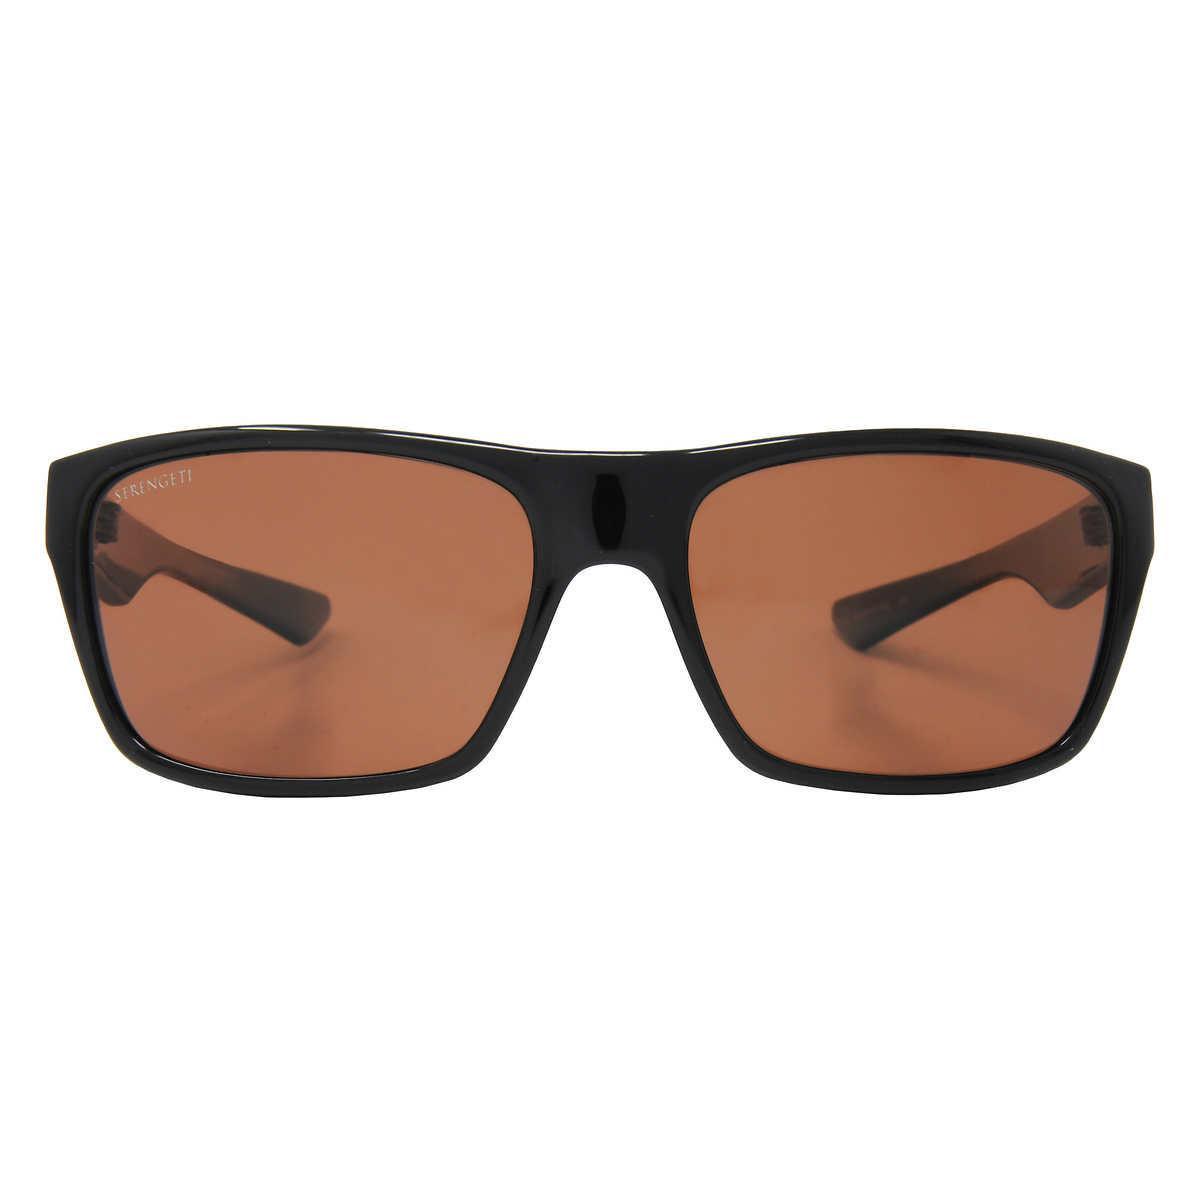 31a5c19d5d Serengeti Prescription Sunglasses Price